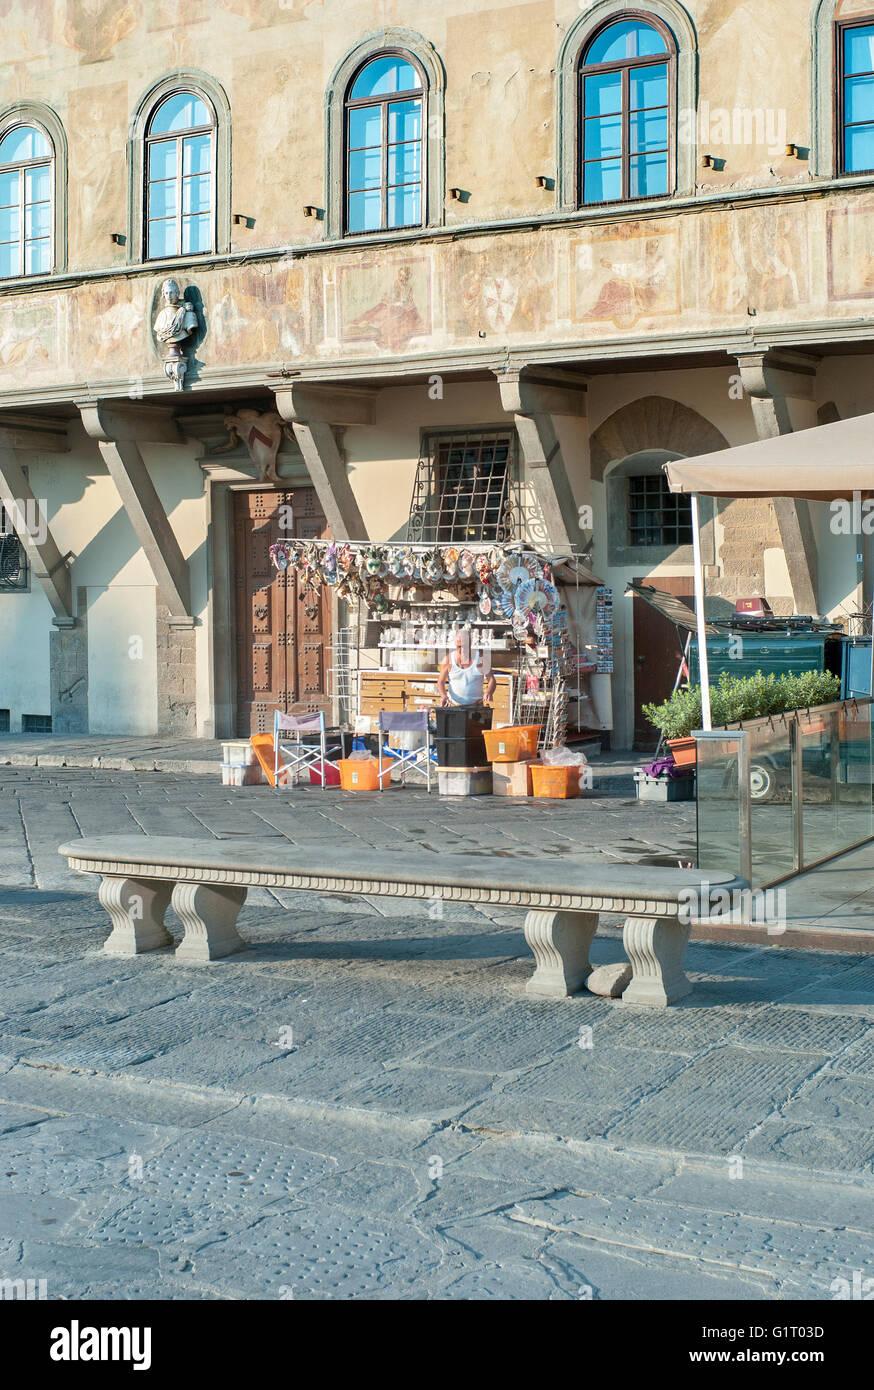 Marktstand Piazza Santa Croce Florenz Italien Stockbild